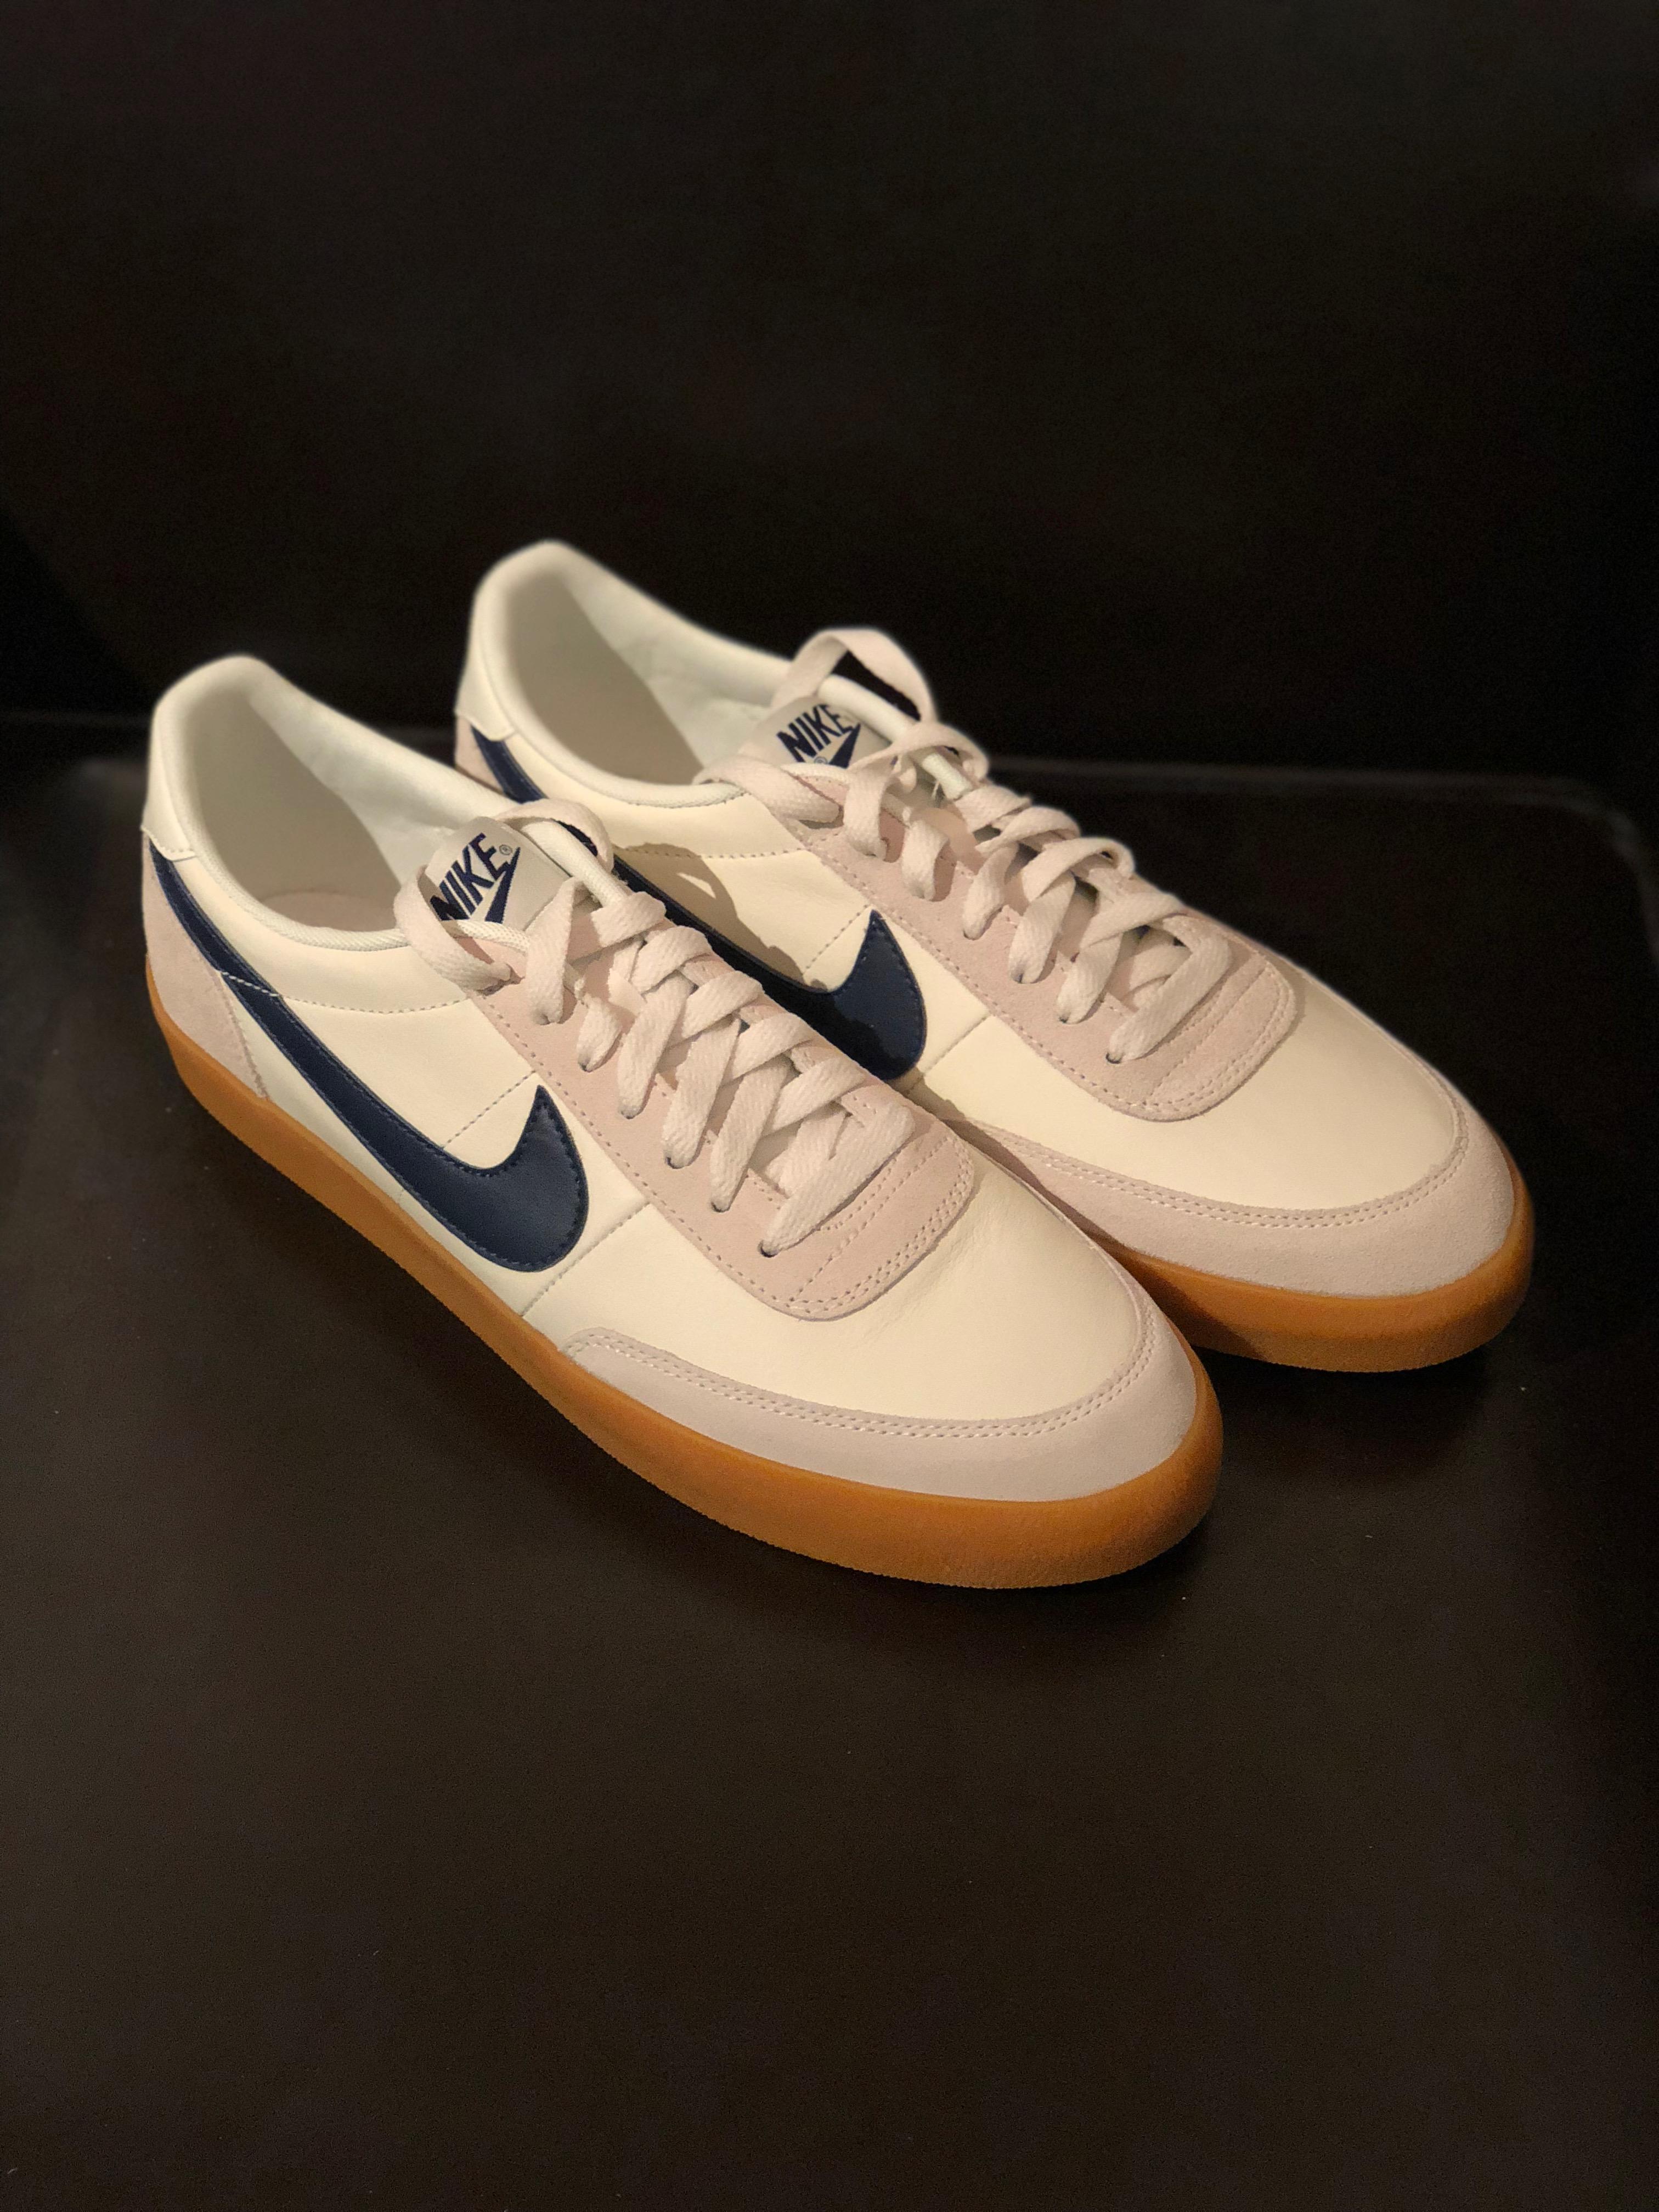 premium selection 9a295 743cf Nike × J.Crew ×. Nike x J.Crew Killshot 2 Leather